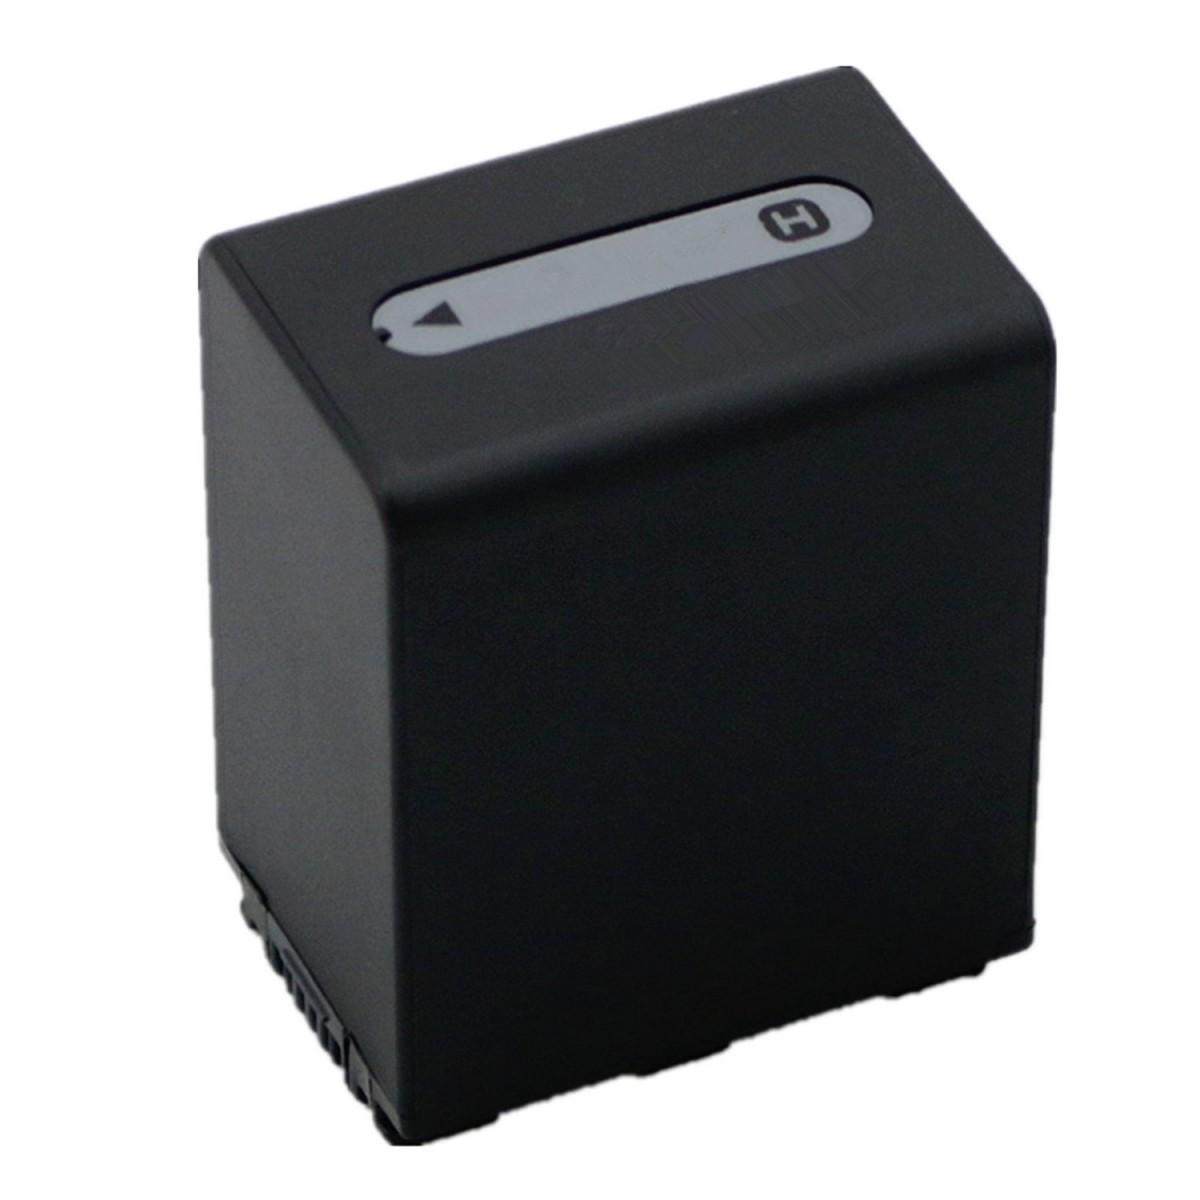 Bateria NP-FH100 3900mAh para câmera digital e filmadora Sony DCR-DVD106, DSC-HX100, HDR-HC3, HDR-CX7, HDR-SR12, Sony HDR-XR100